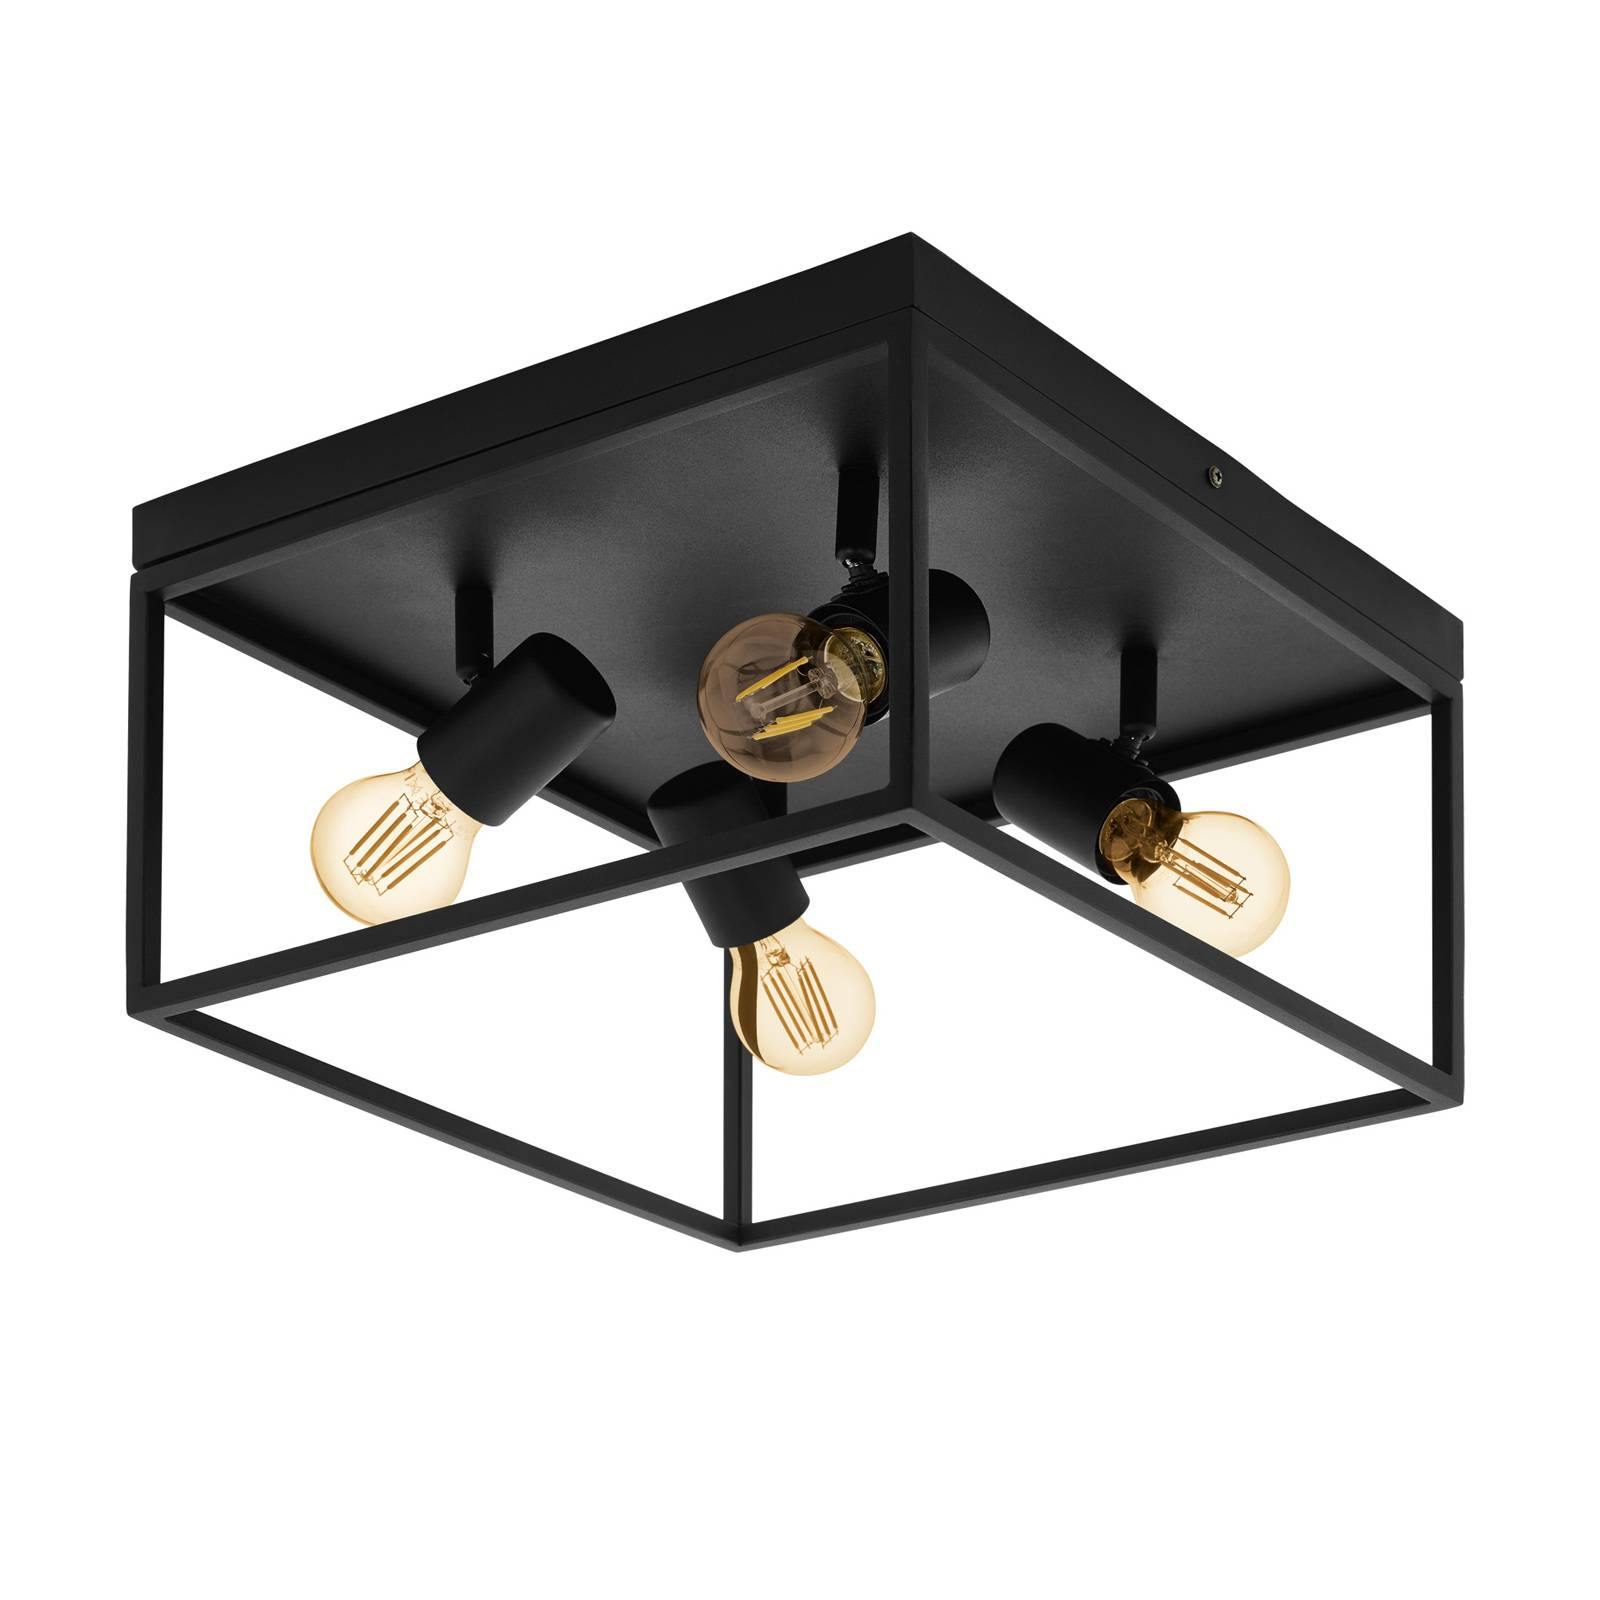 Lampa sufitowa Silentina 4-punktowa, 36x36cm